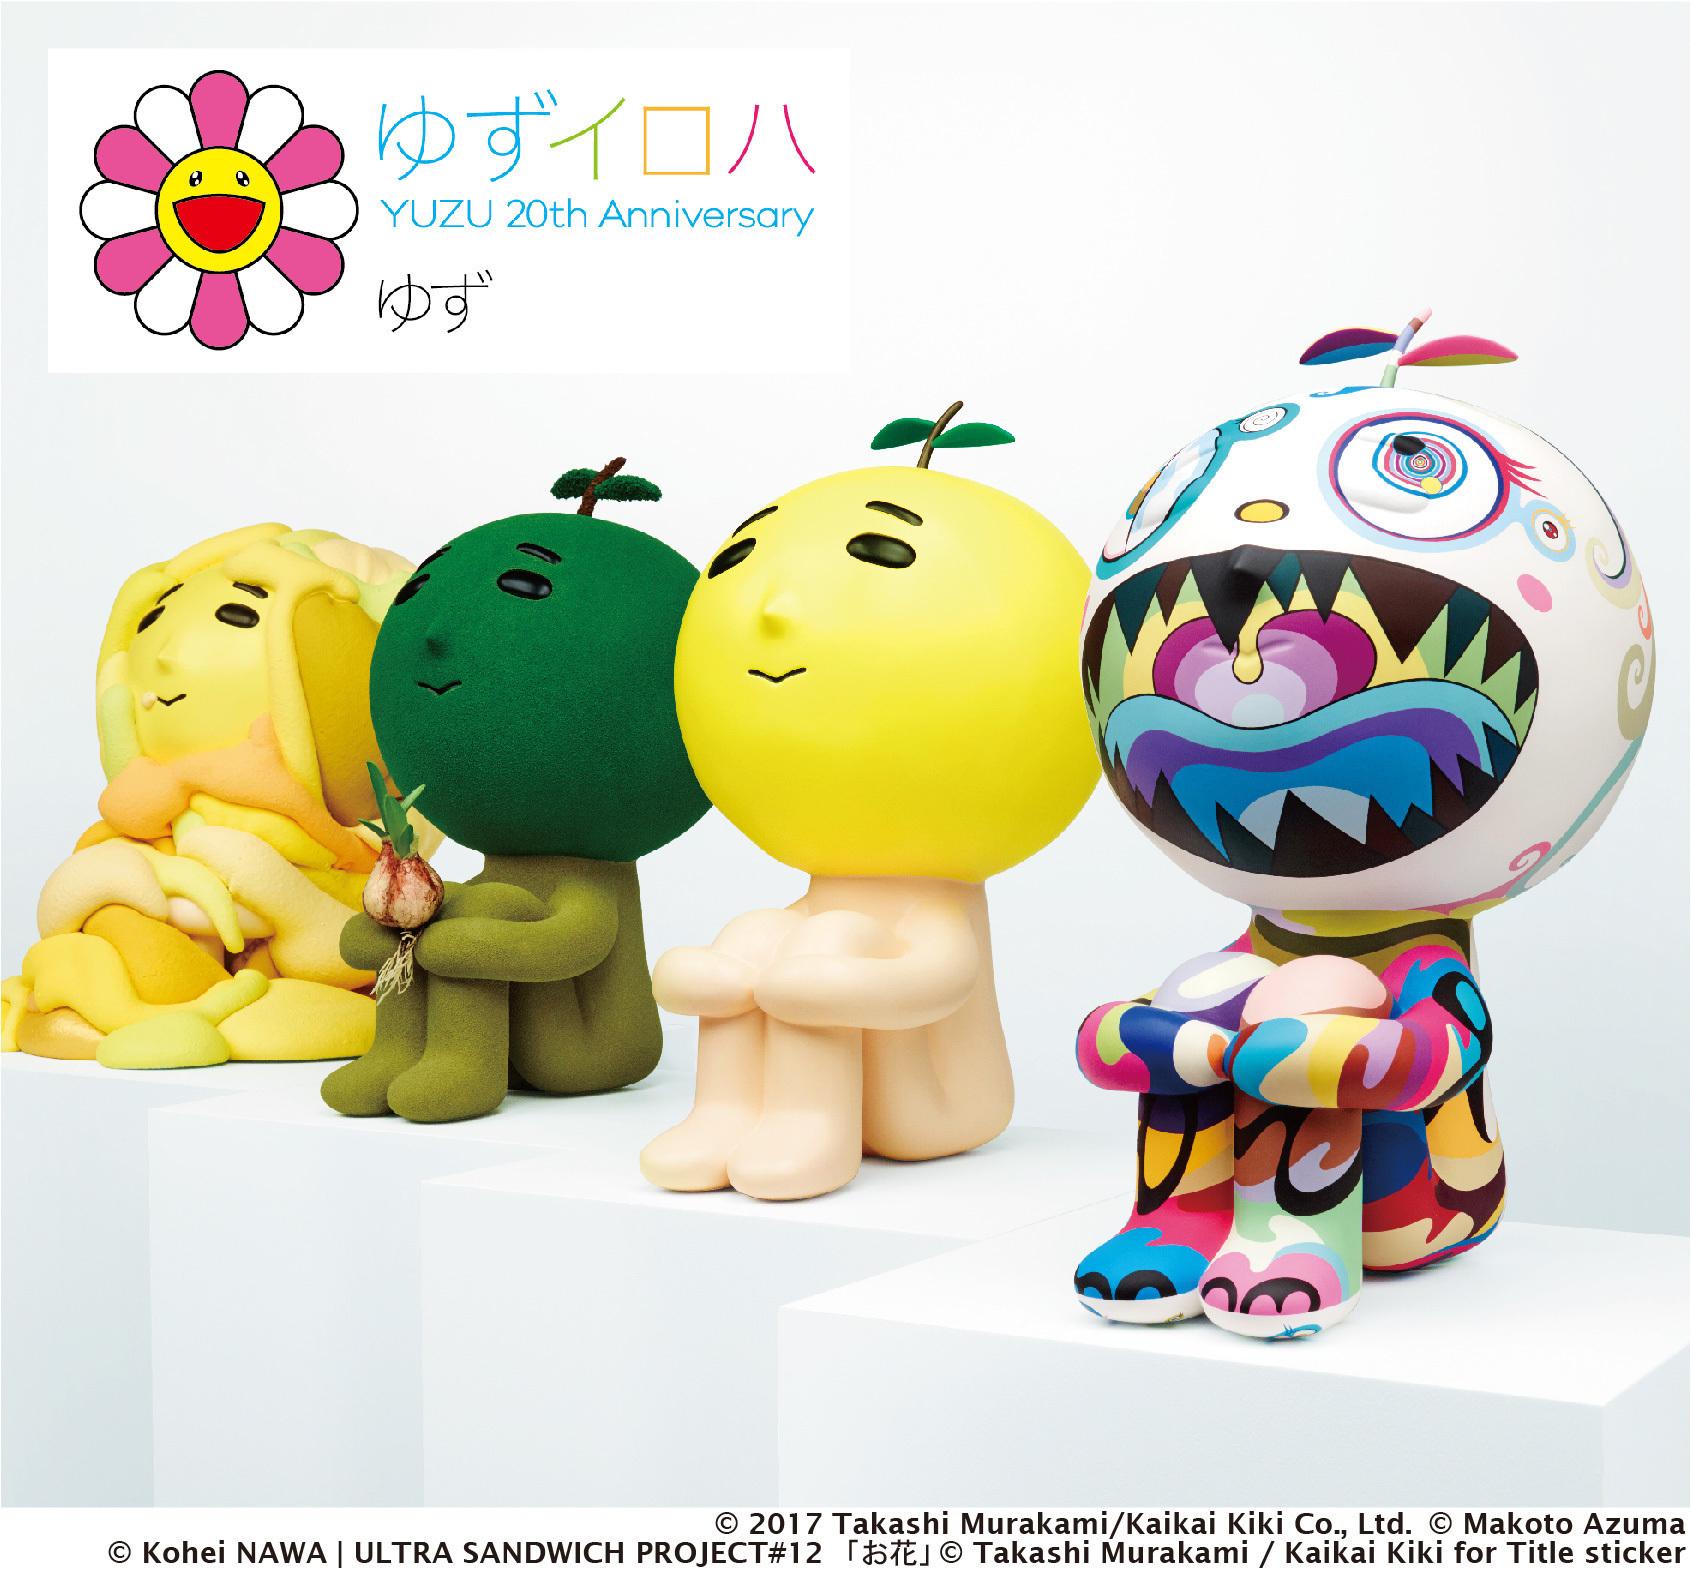 NekoPOP-Yuzu-Iroha-best-cover